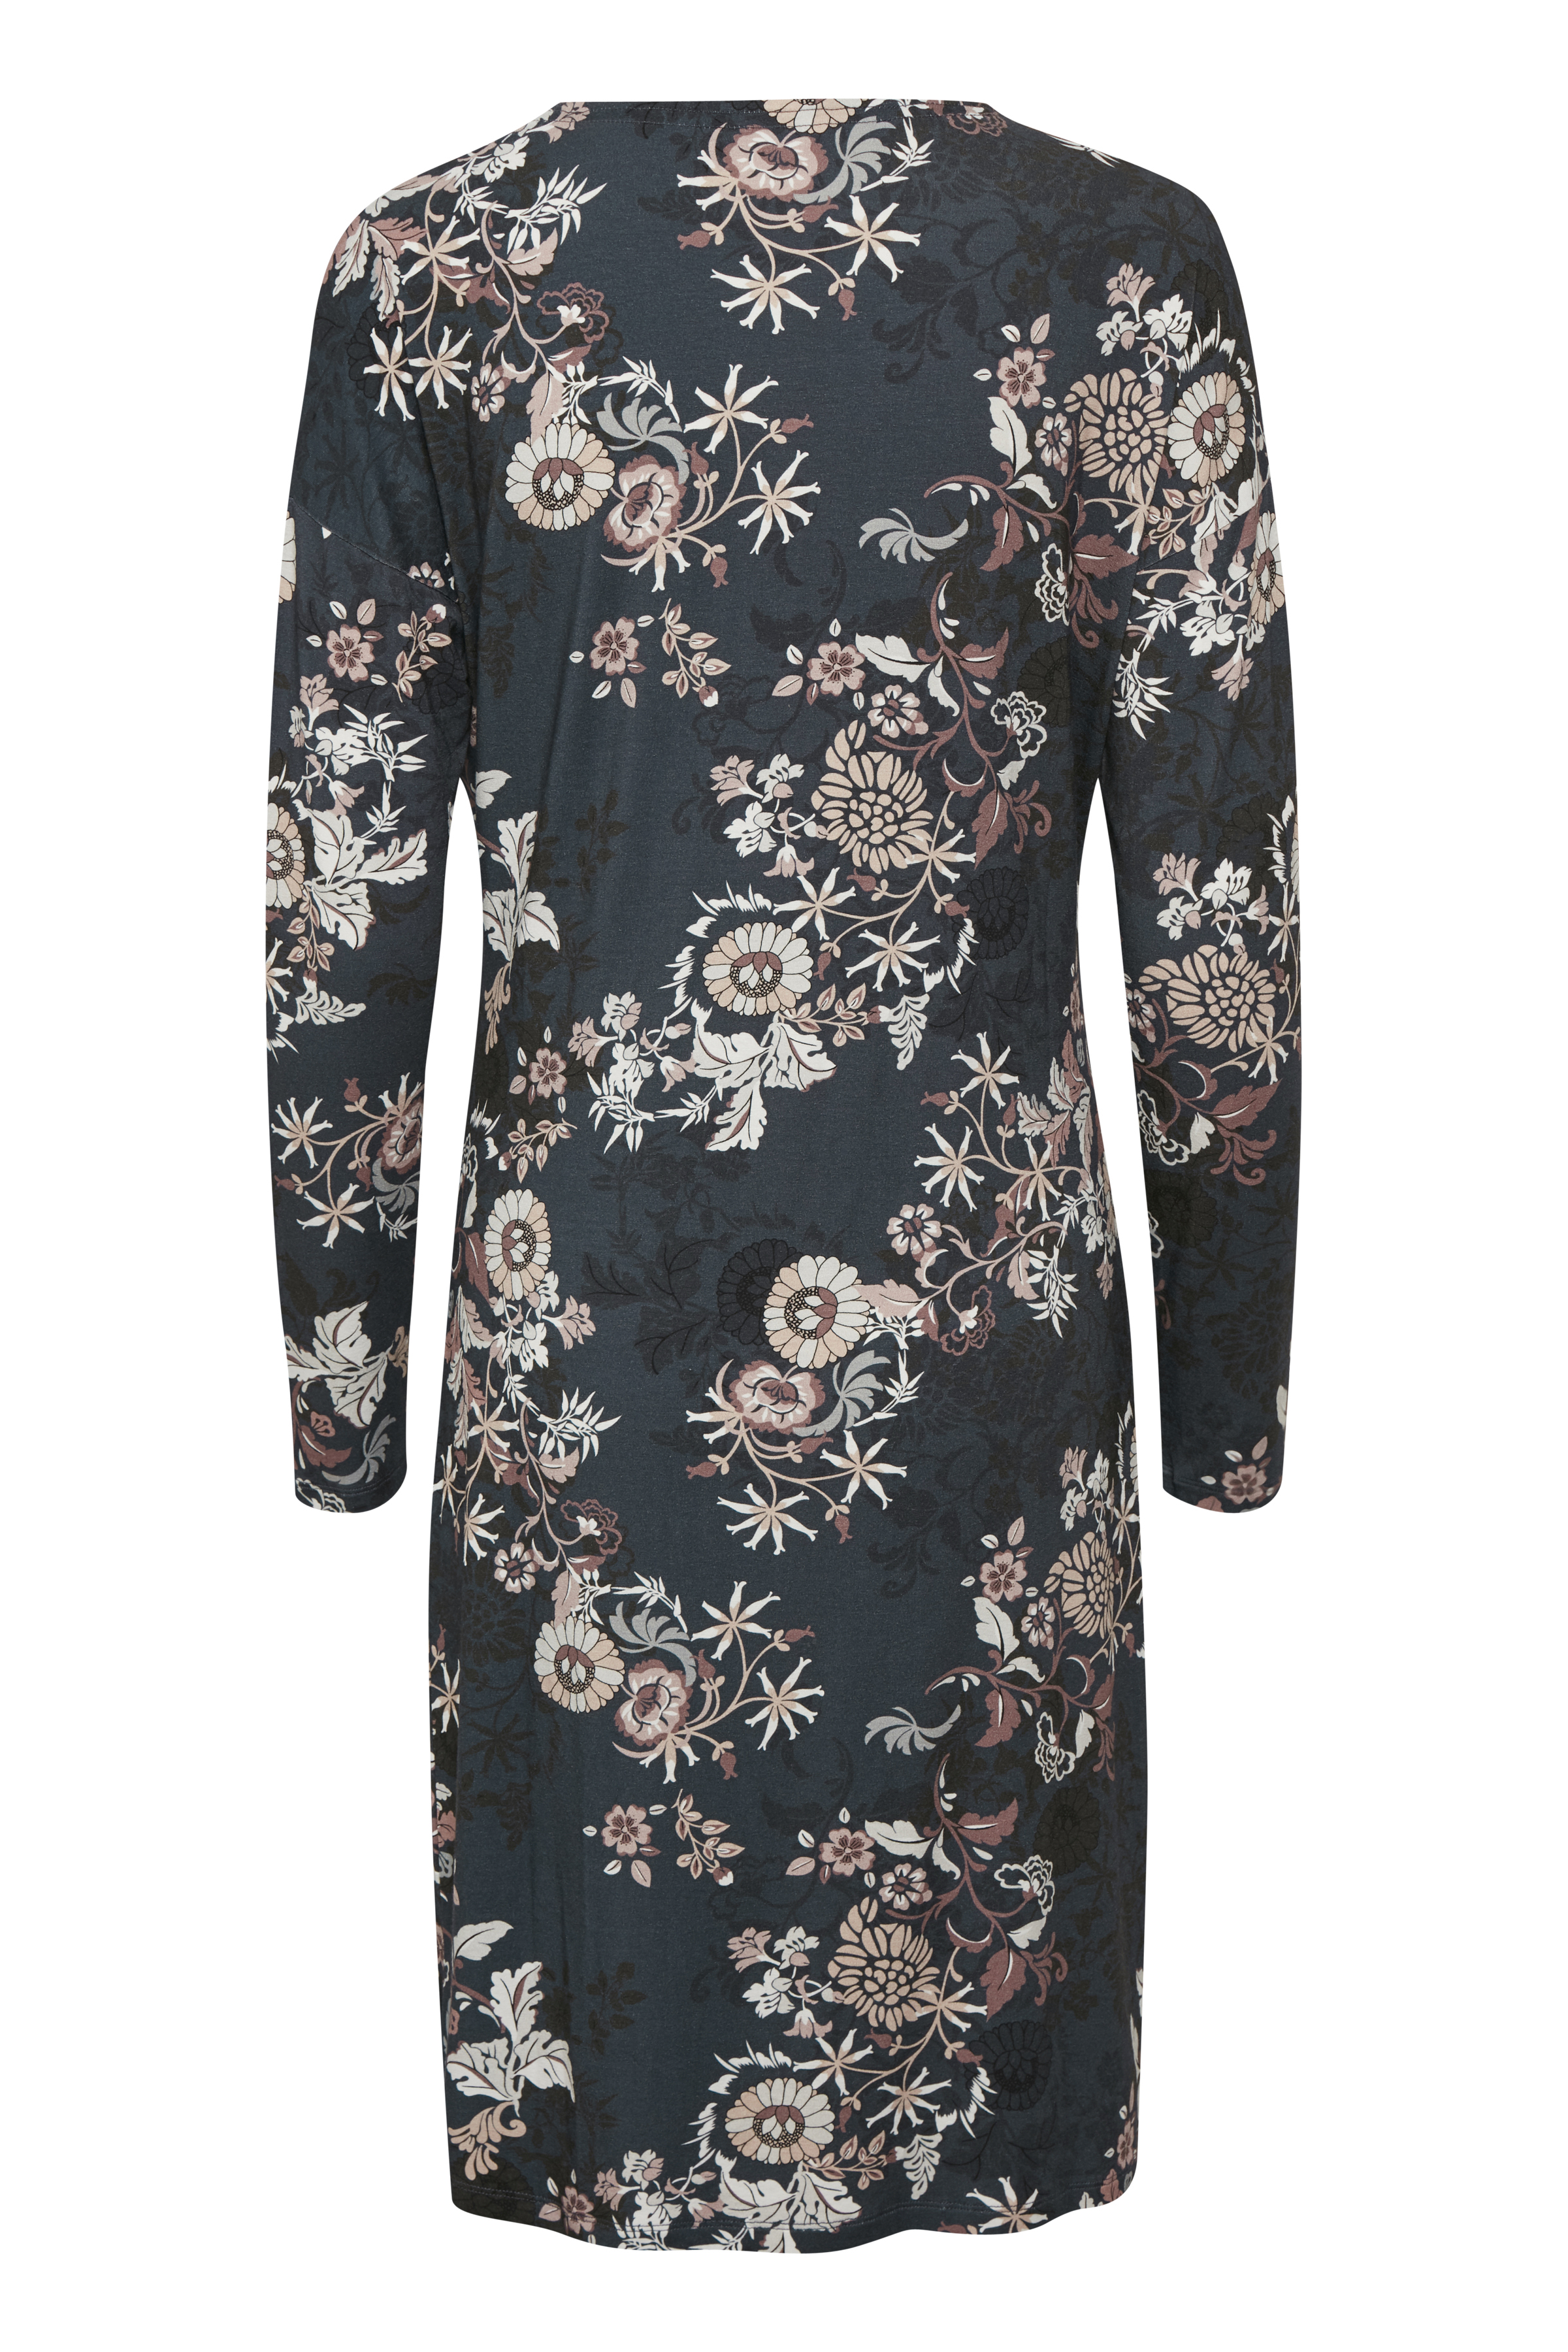 Marineblau/rosa Kleid von Bon'A Parte – Shoppen Sie Marineblau/rosa Kleid ab Gr. S-2XL hier